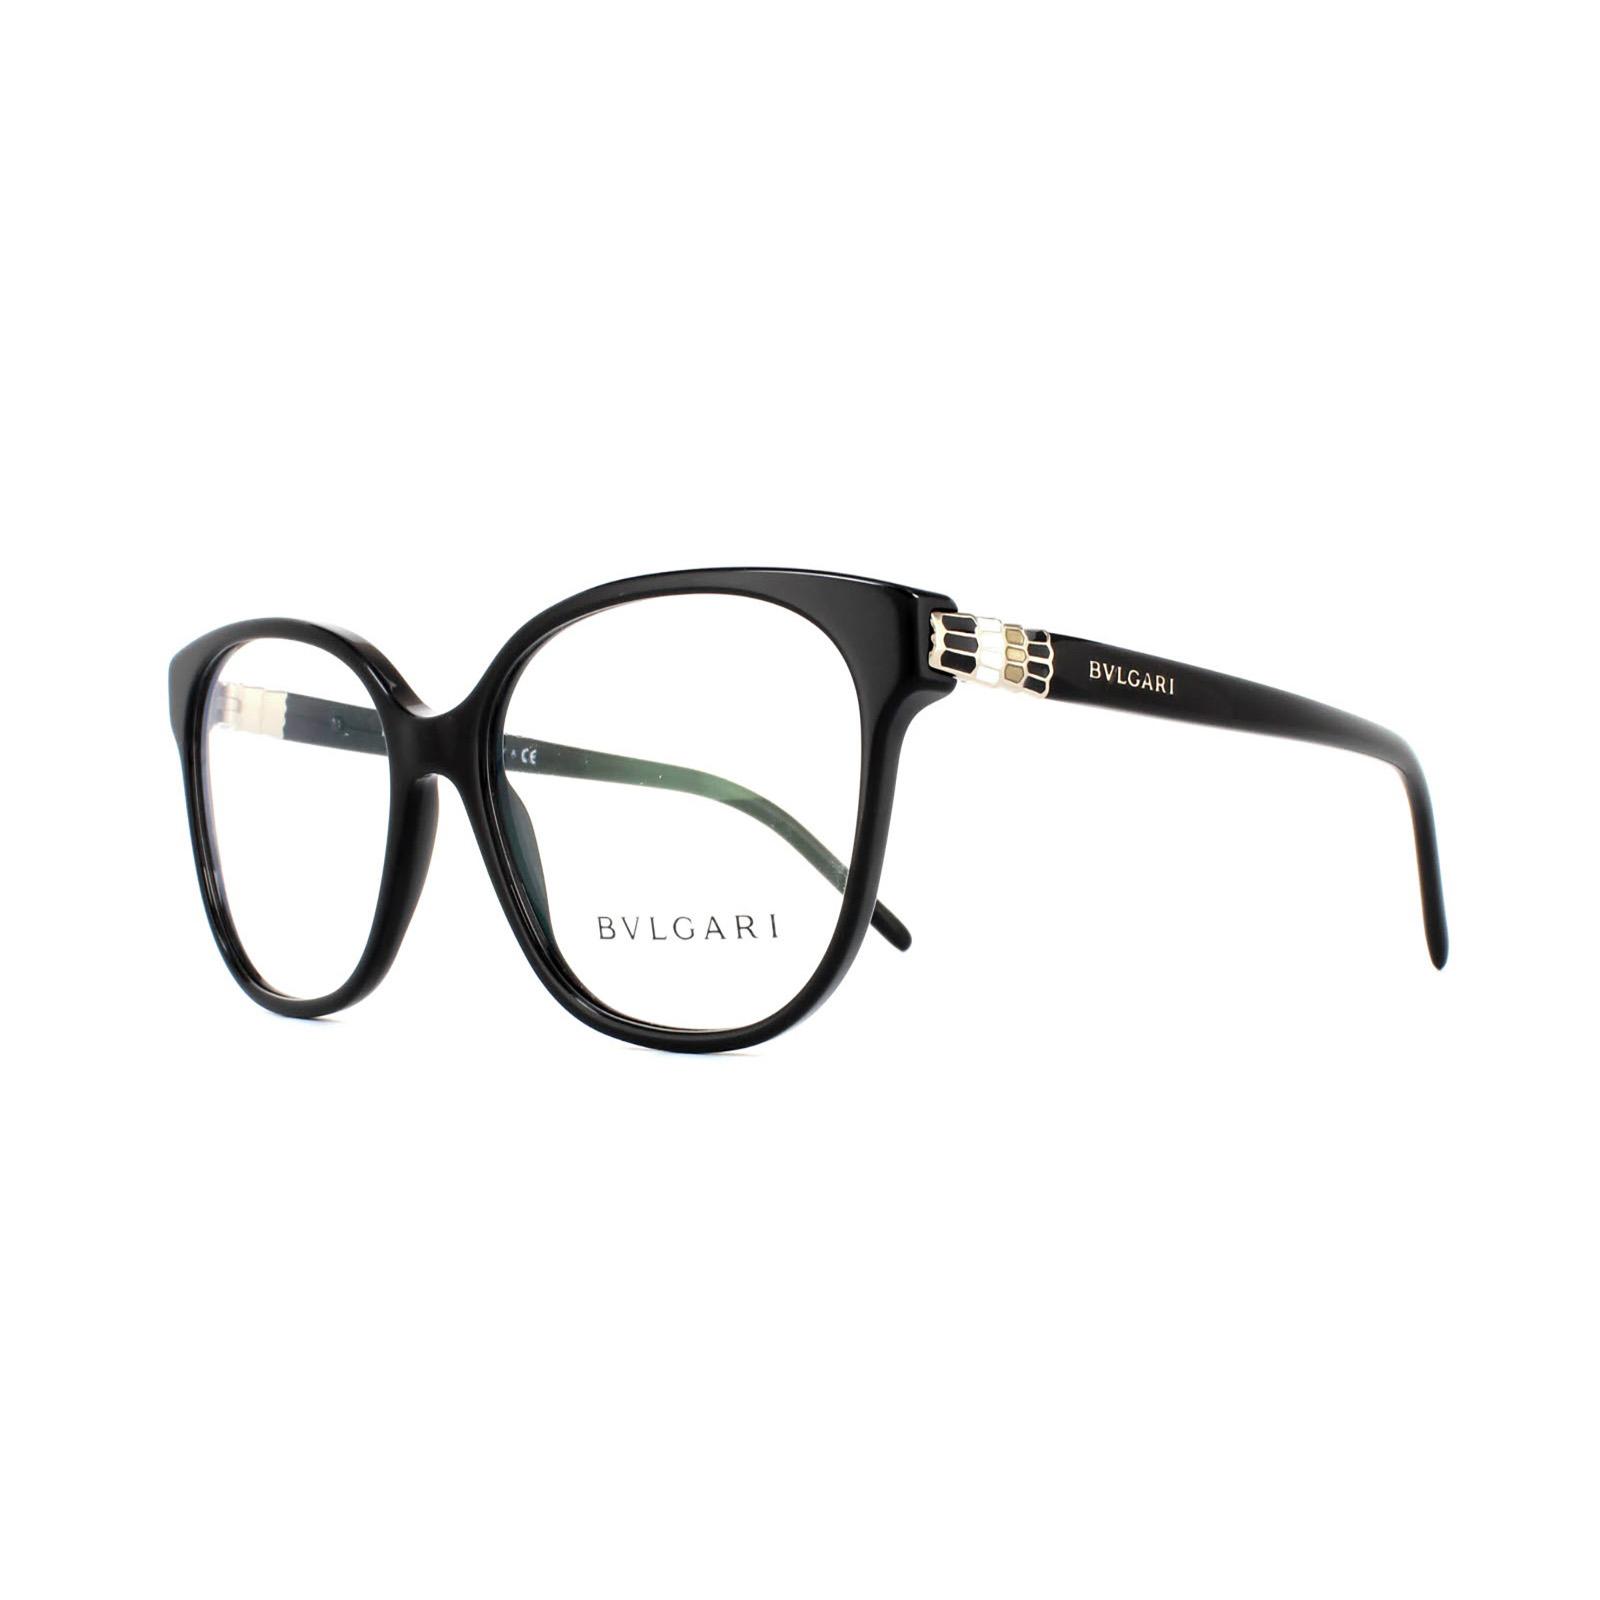 Exelent Bvlgari Glasses Frames With Crystal Flowers Pattern - Framed ...